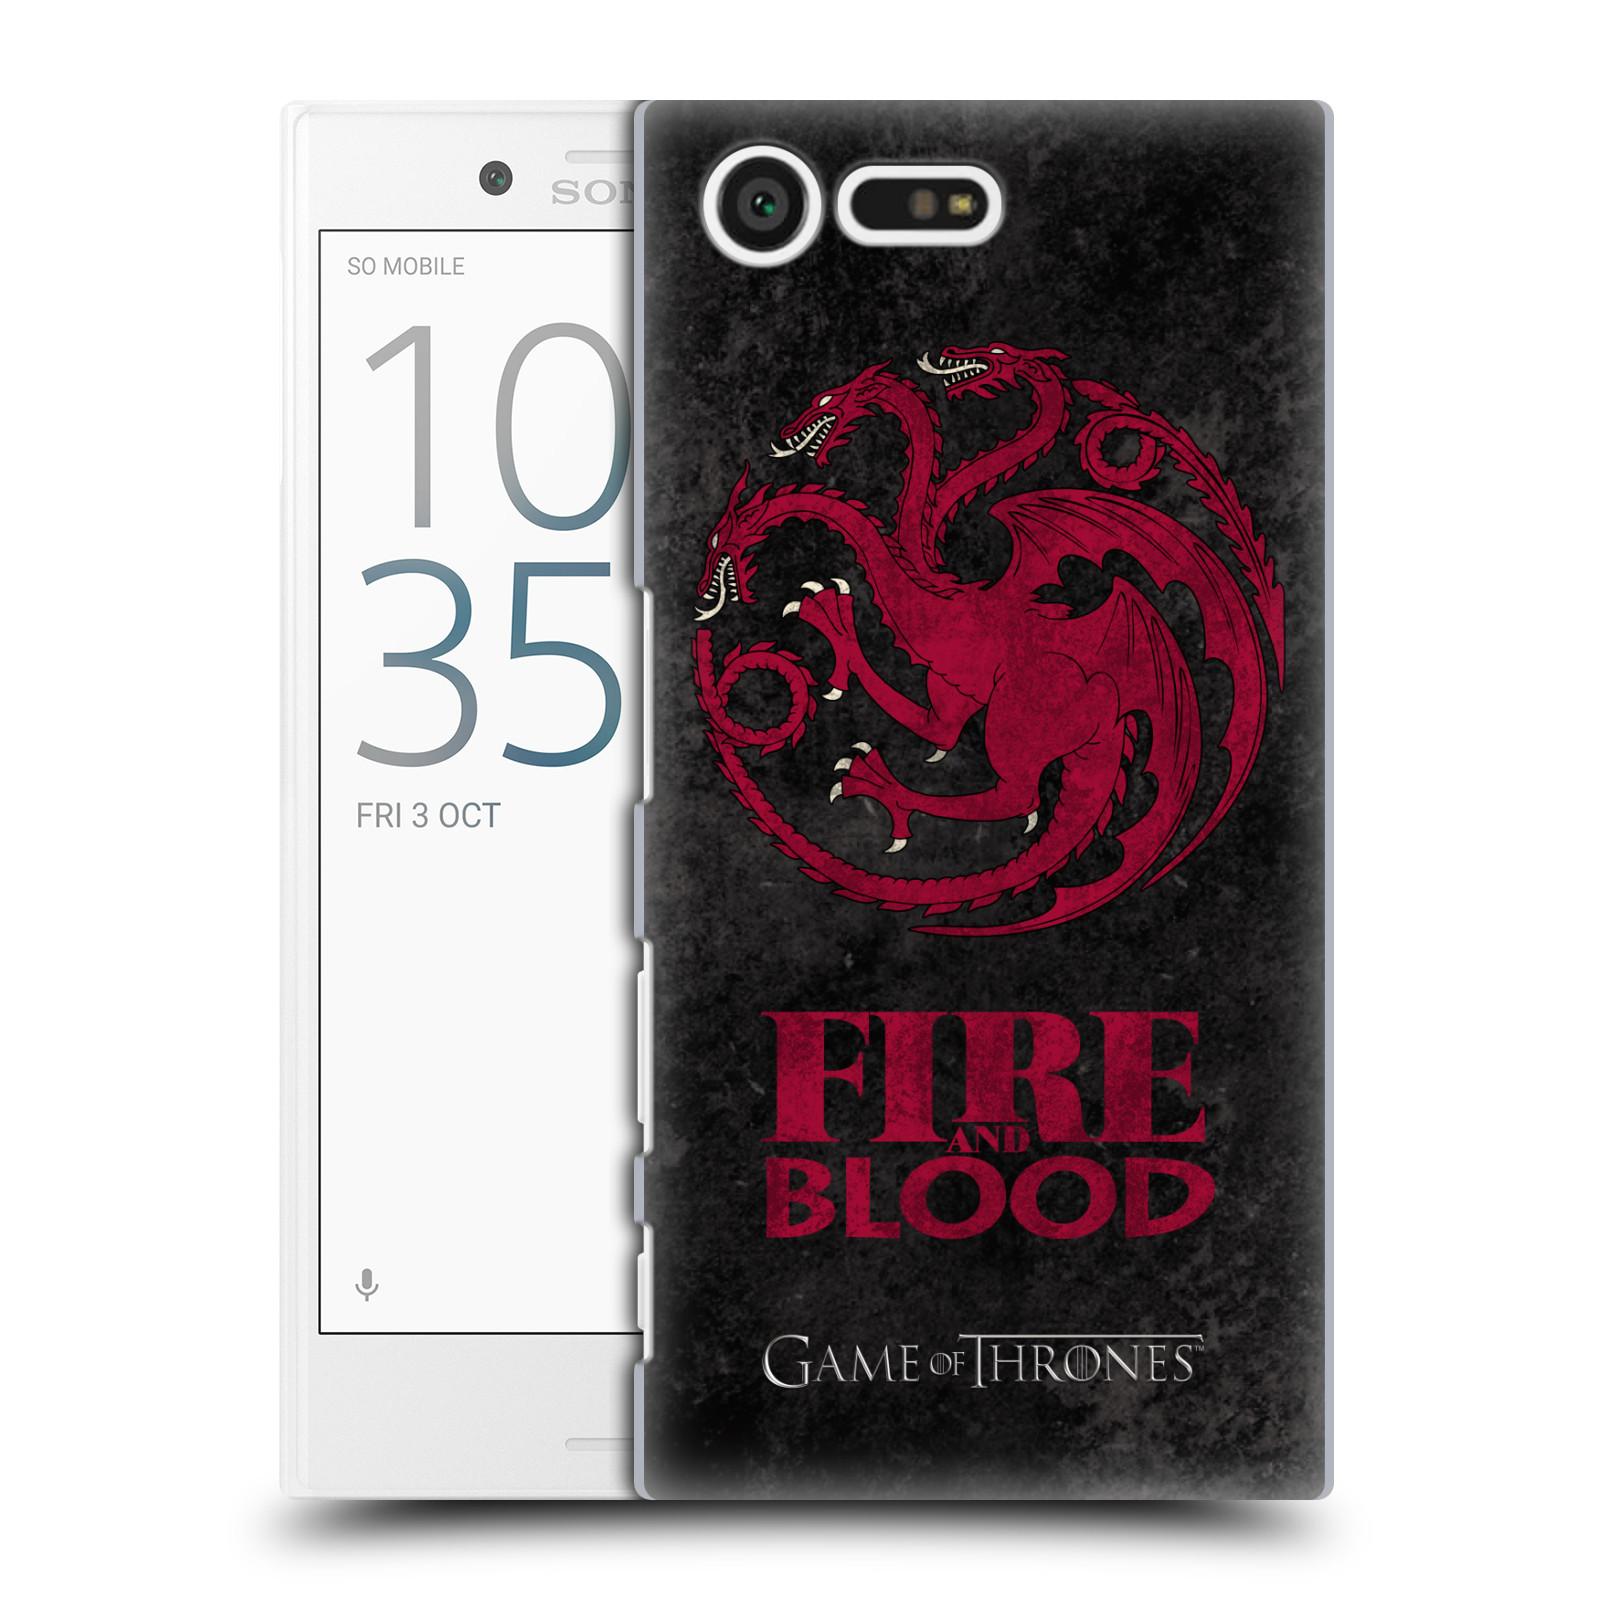 Plastové pouzdro na mobil Sony Xperia X Compact HEAD CASE Hra o trůny - Sigils Targaryen - Fire and Blood (Plastový kryt či obal na mobilní telefon s licencovaným motivem Hra o trůny - Game Of Thrones pro Sony Xperia X Compact F5321)